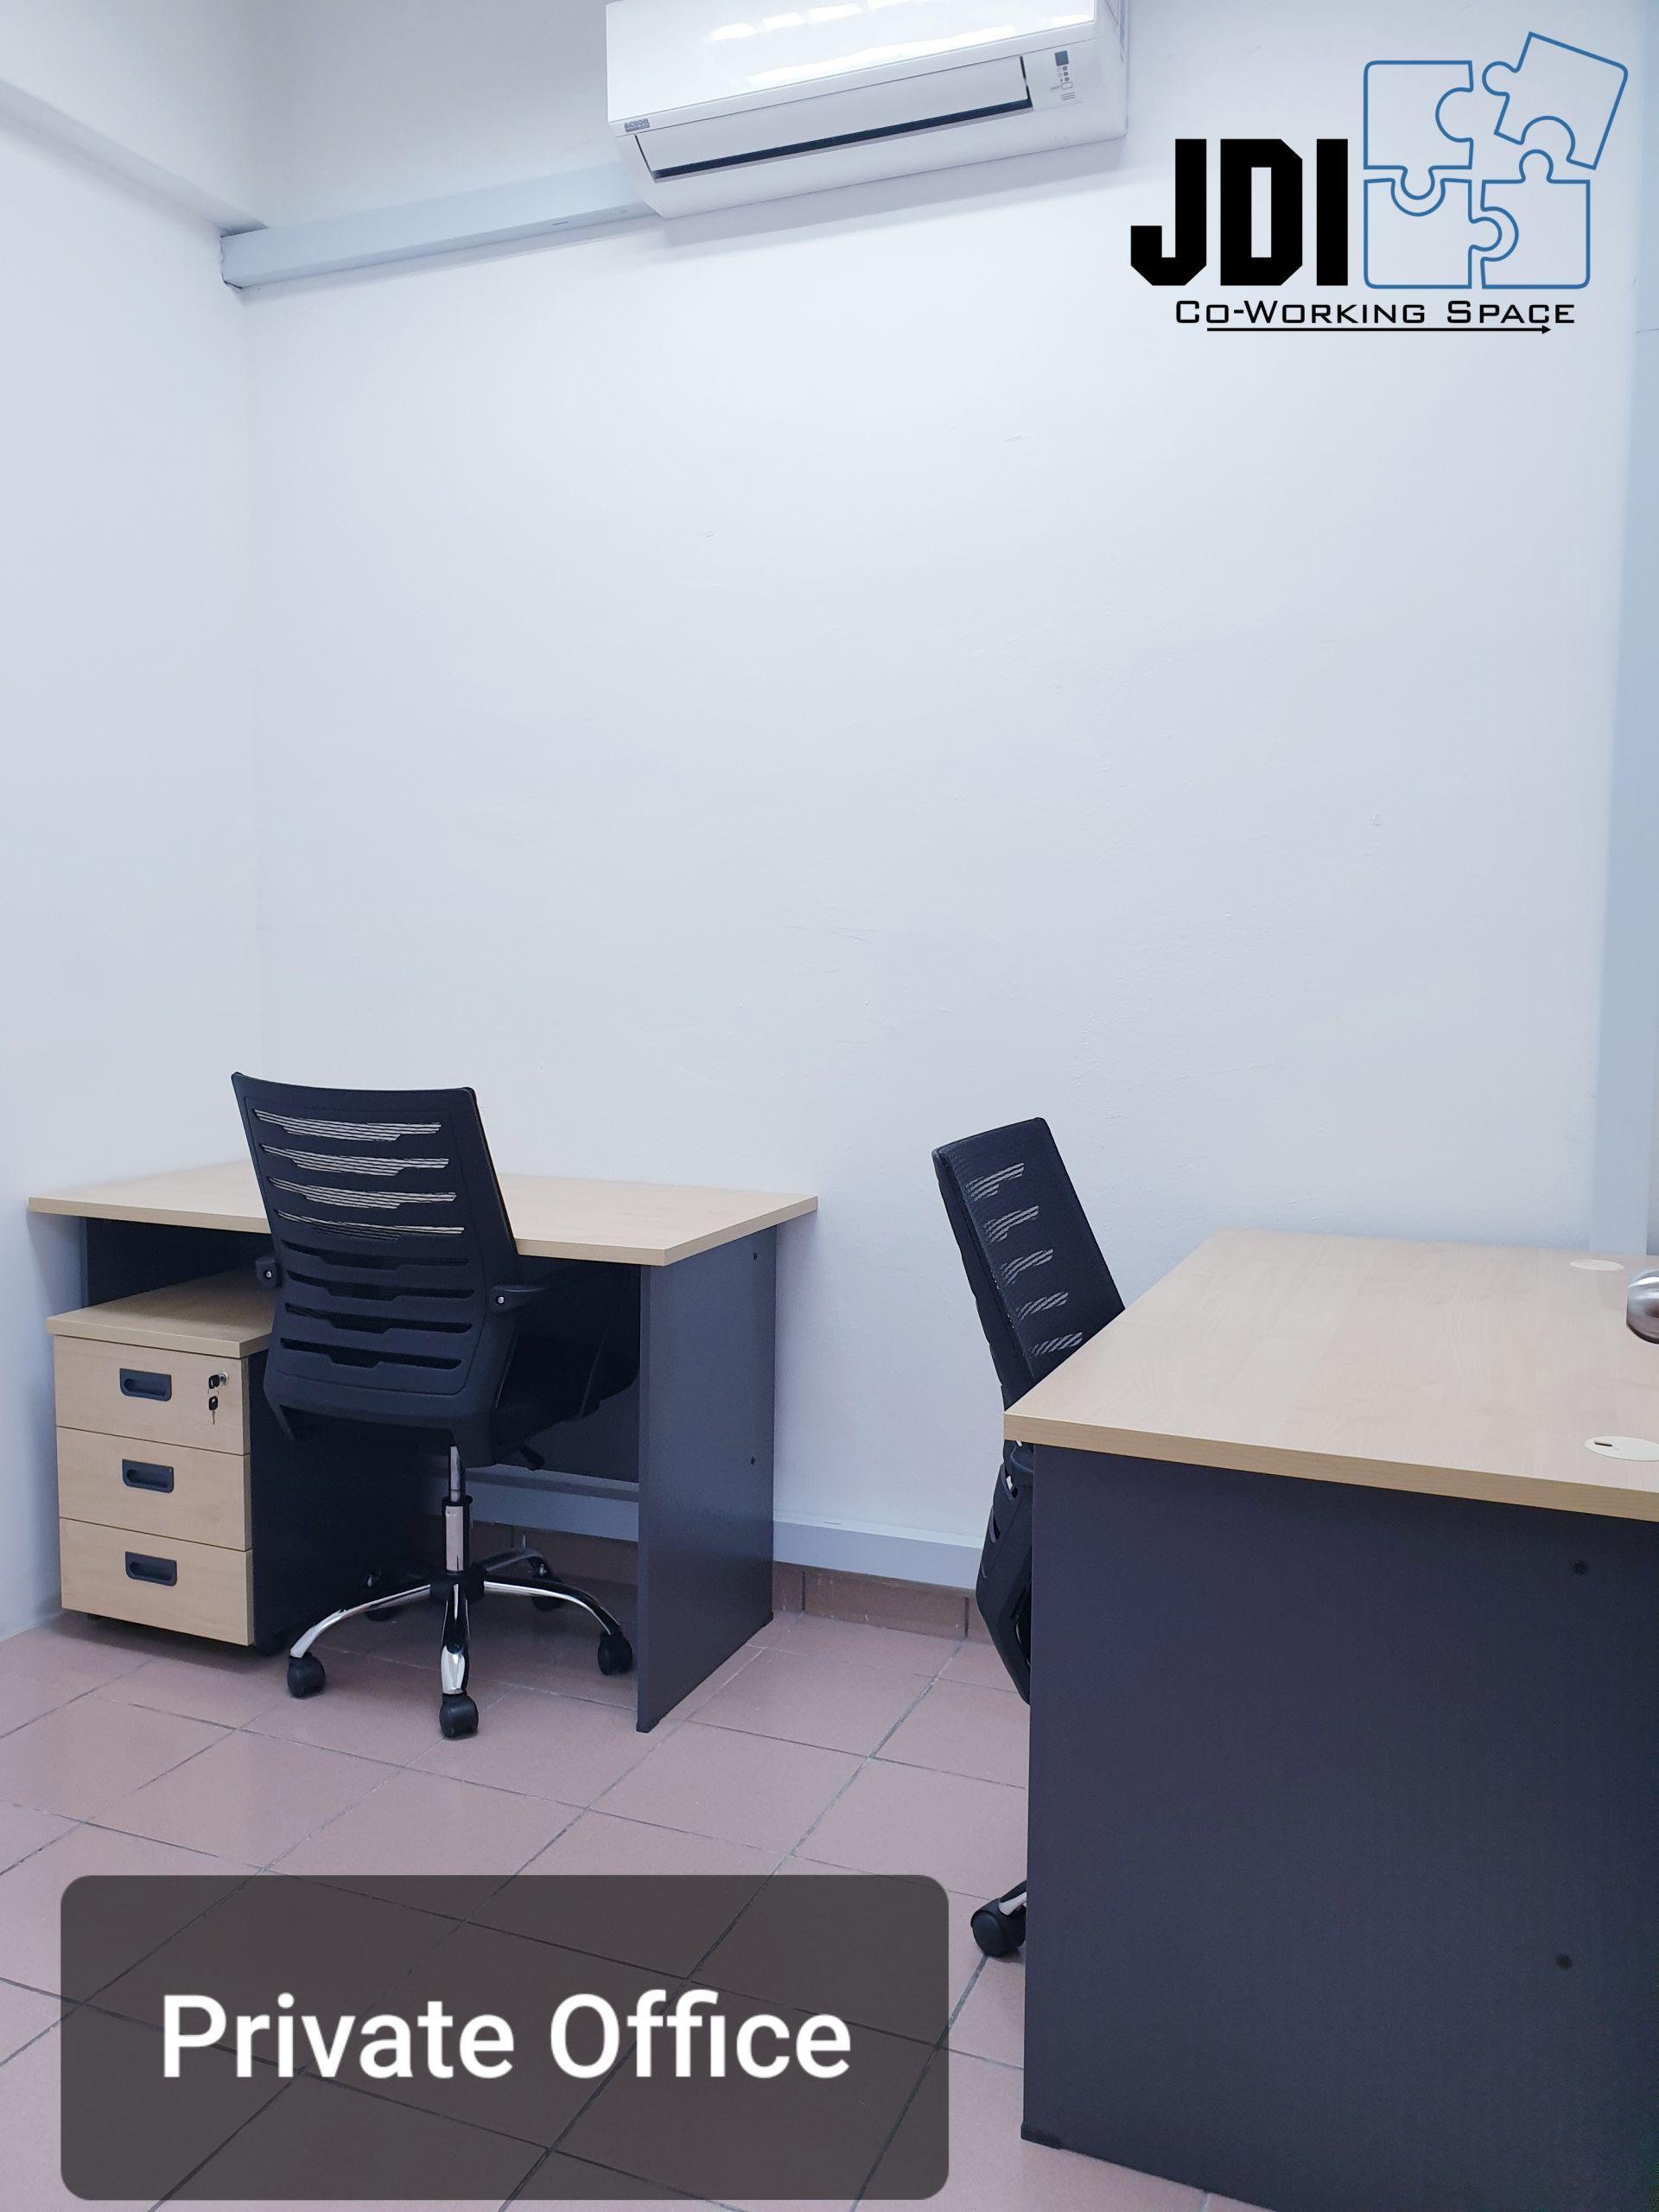 JDI Co-Working Space, Port Klang